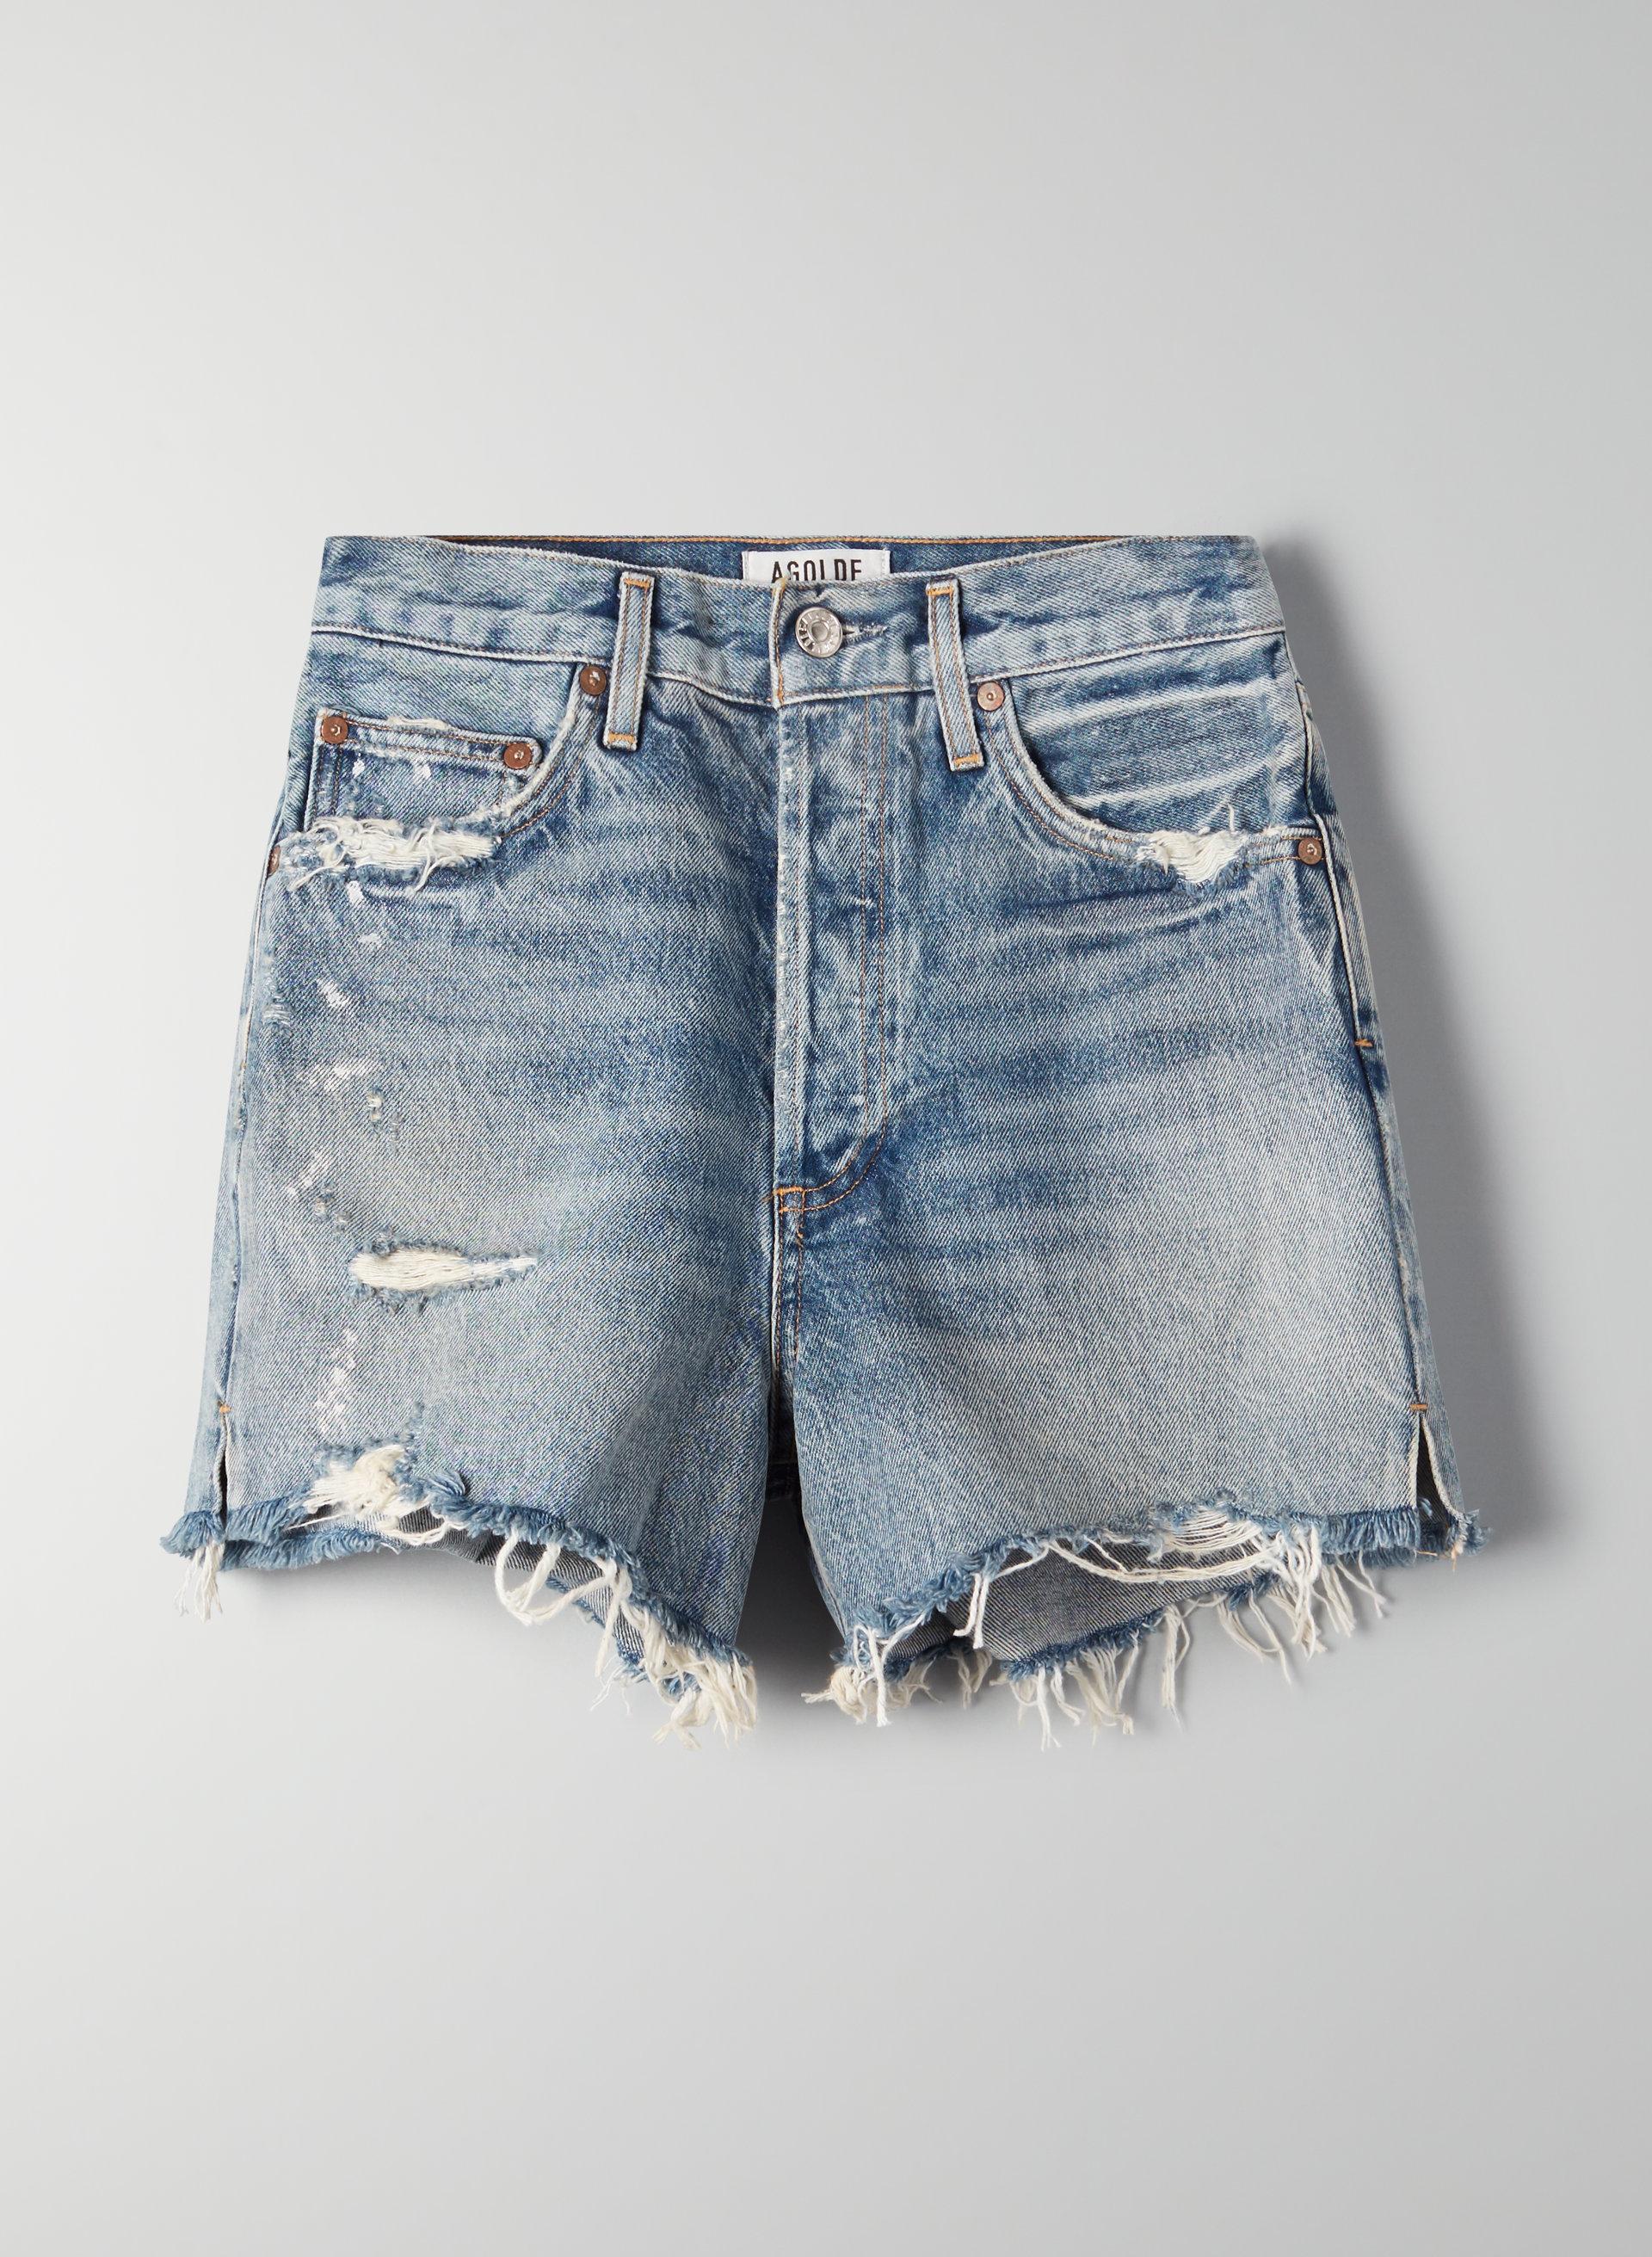 ae37ba8fbf DEE RICCOCHET - High-waisted, ripped denim shorts